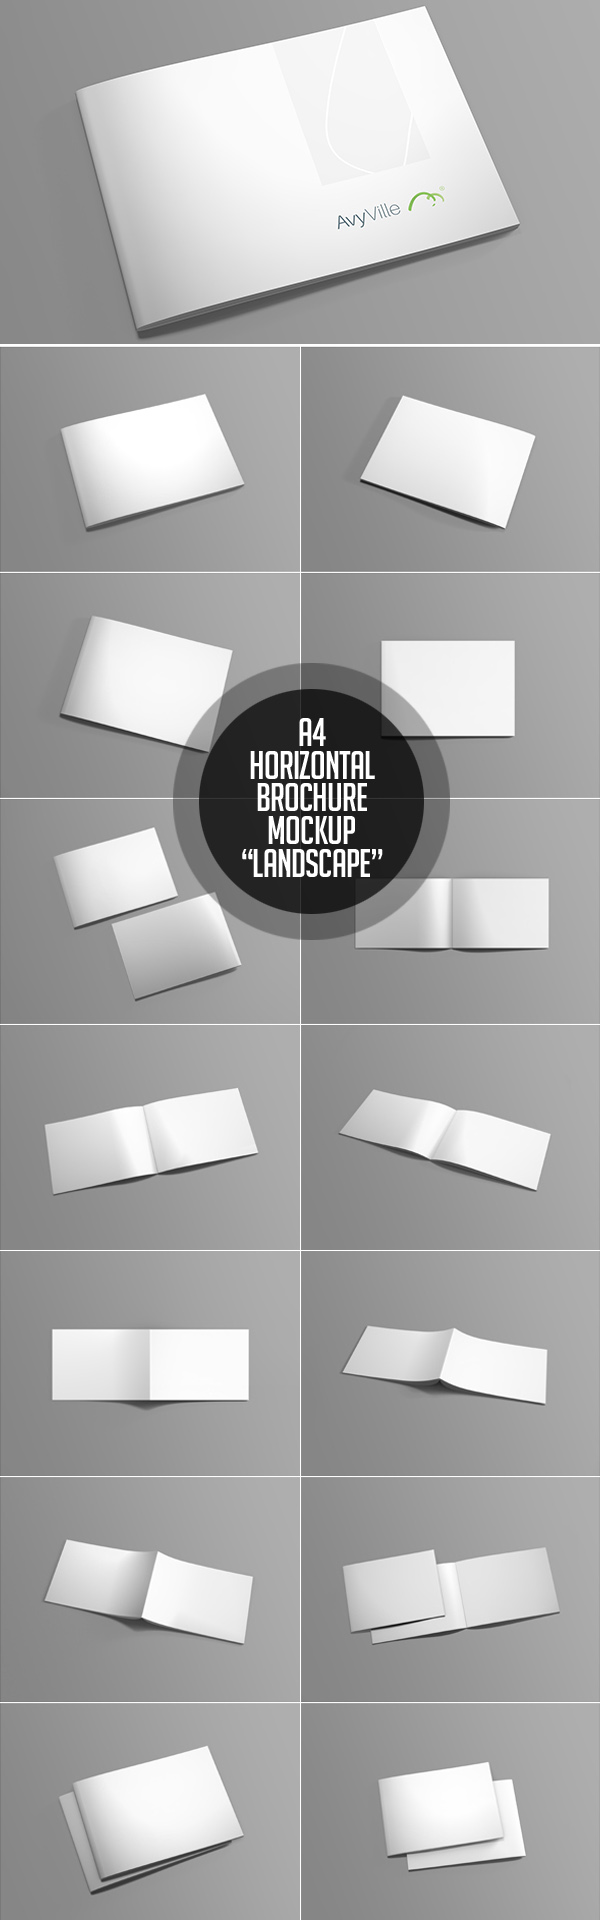 15_Landscape Brochure PSD Mockup